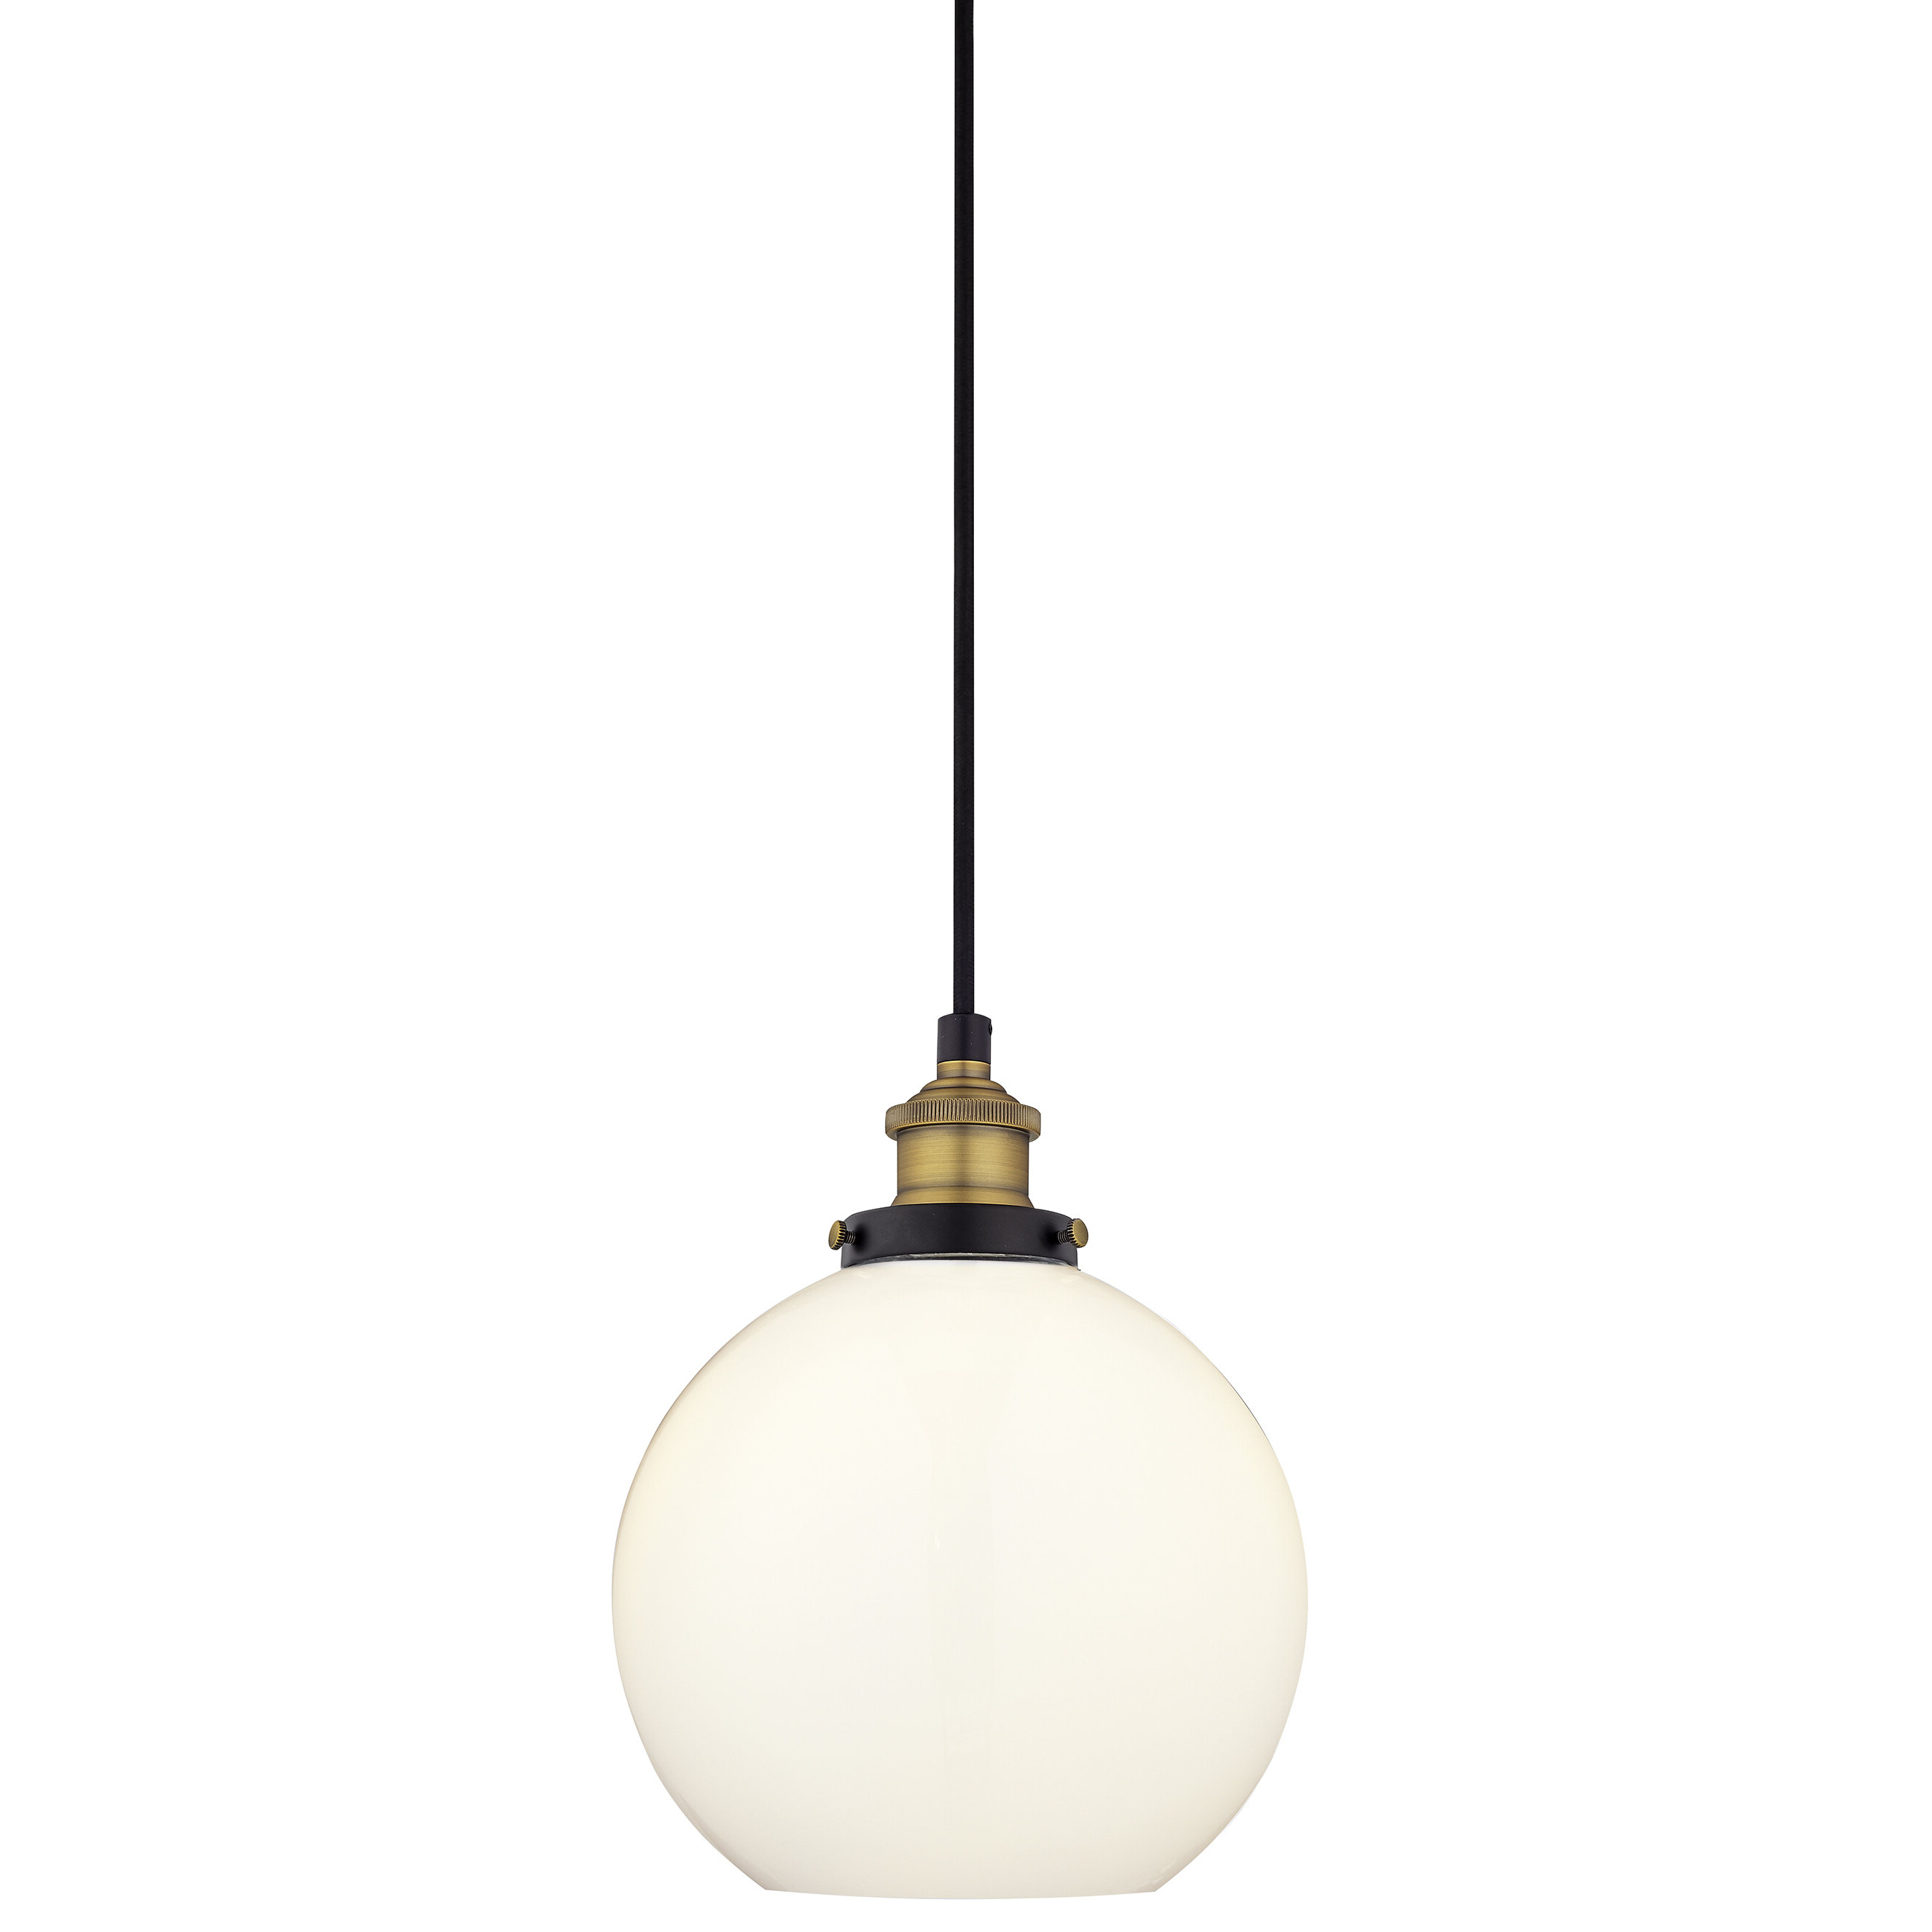 1 Light Geometric Globe Pendants With Regard To 2020 Dunneback 1 Light Single Globe Pendant (View 7 of 20)